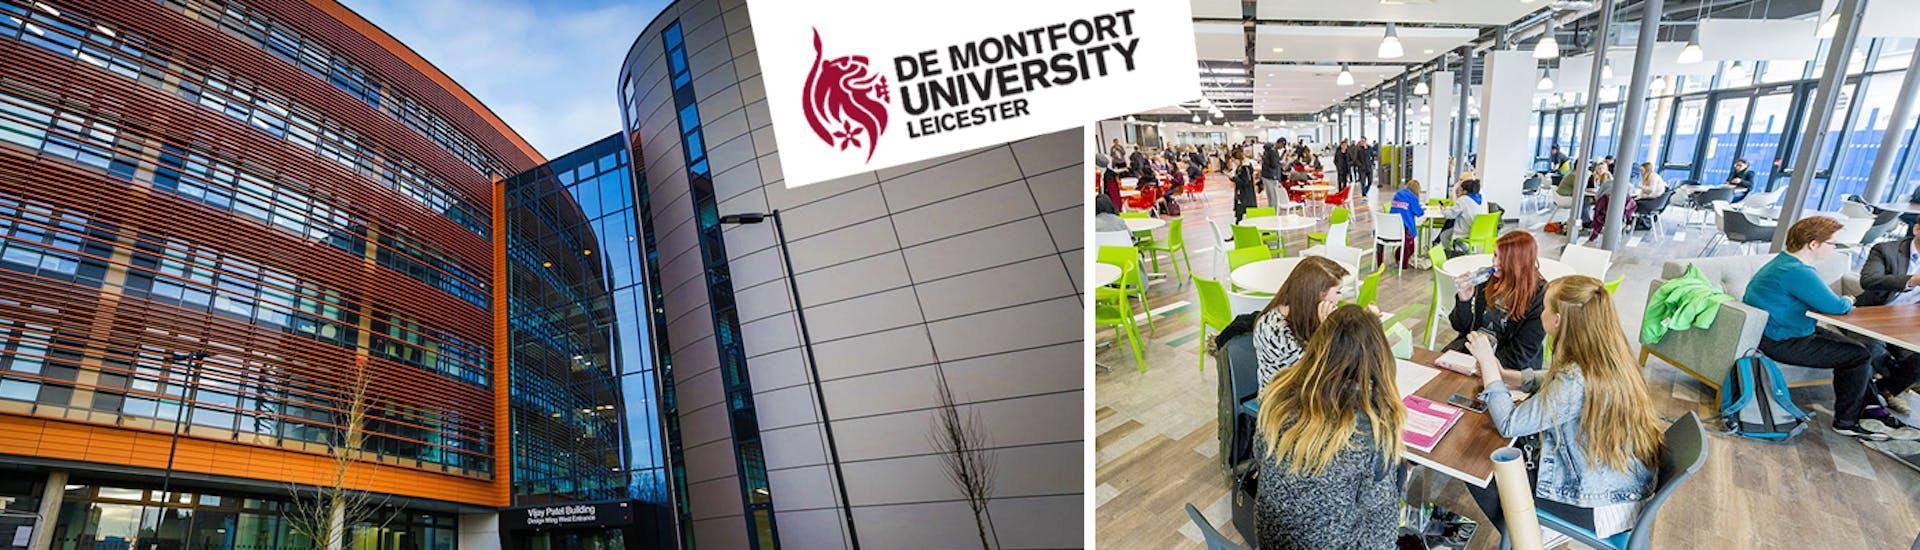 Fashion And Textiles M A De Montfort University Leicester United Kingdom Mastersportal Com